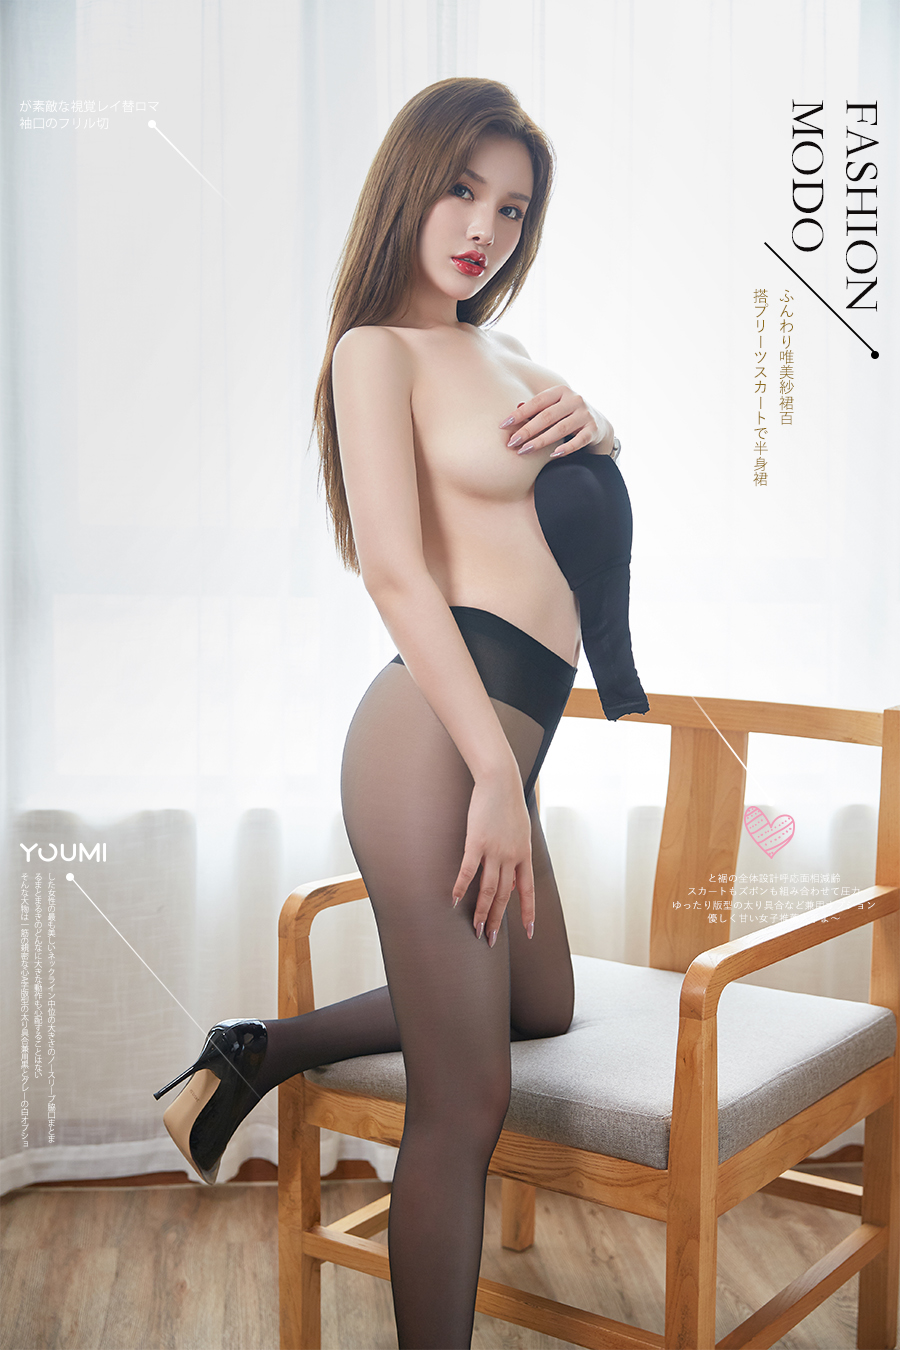 [YouMi尤蜜]2019.10.04 妍姿丽影 陈宇曦[/28MB]